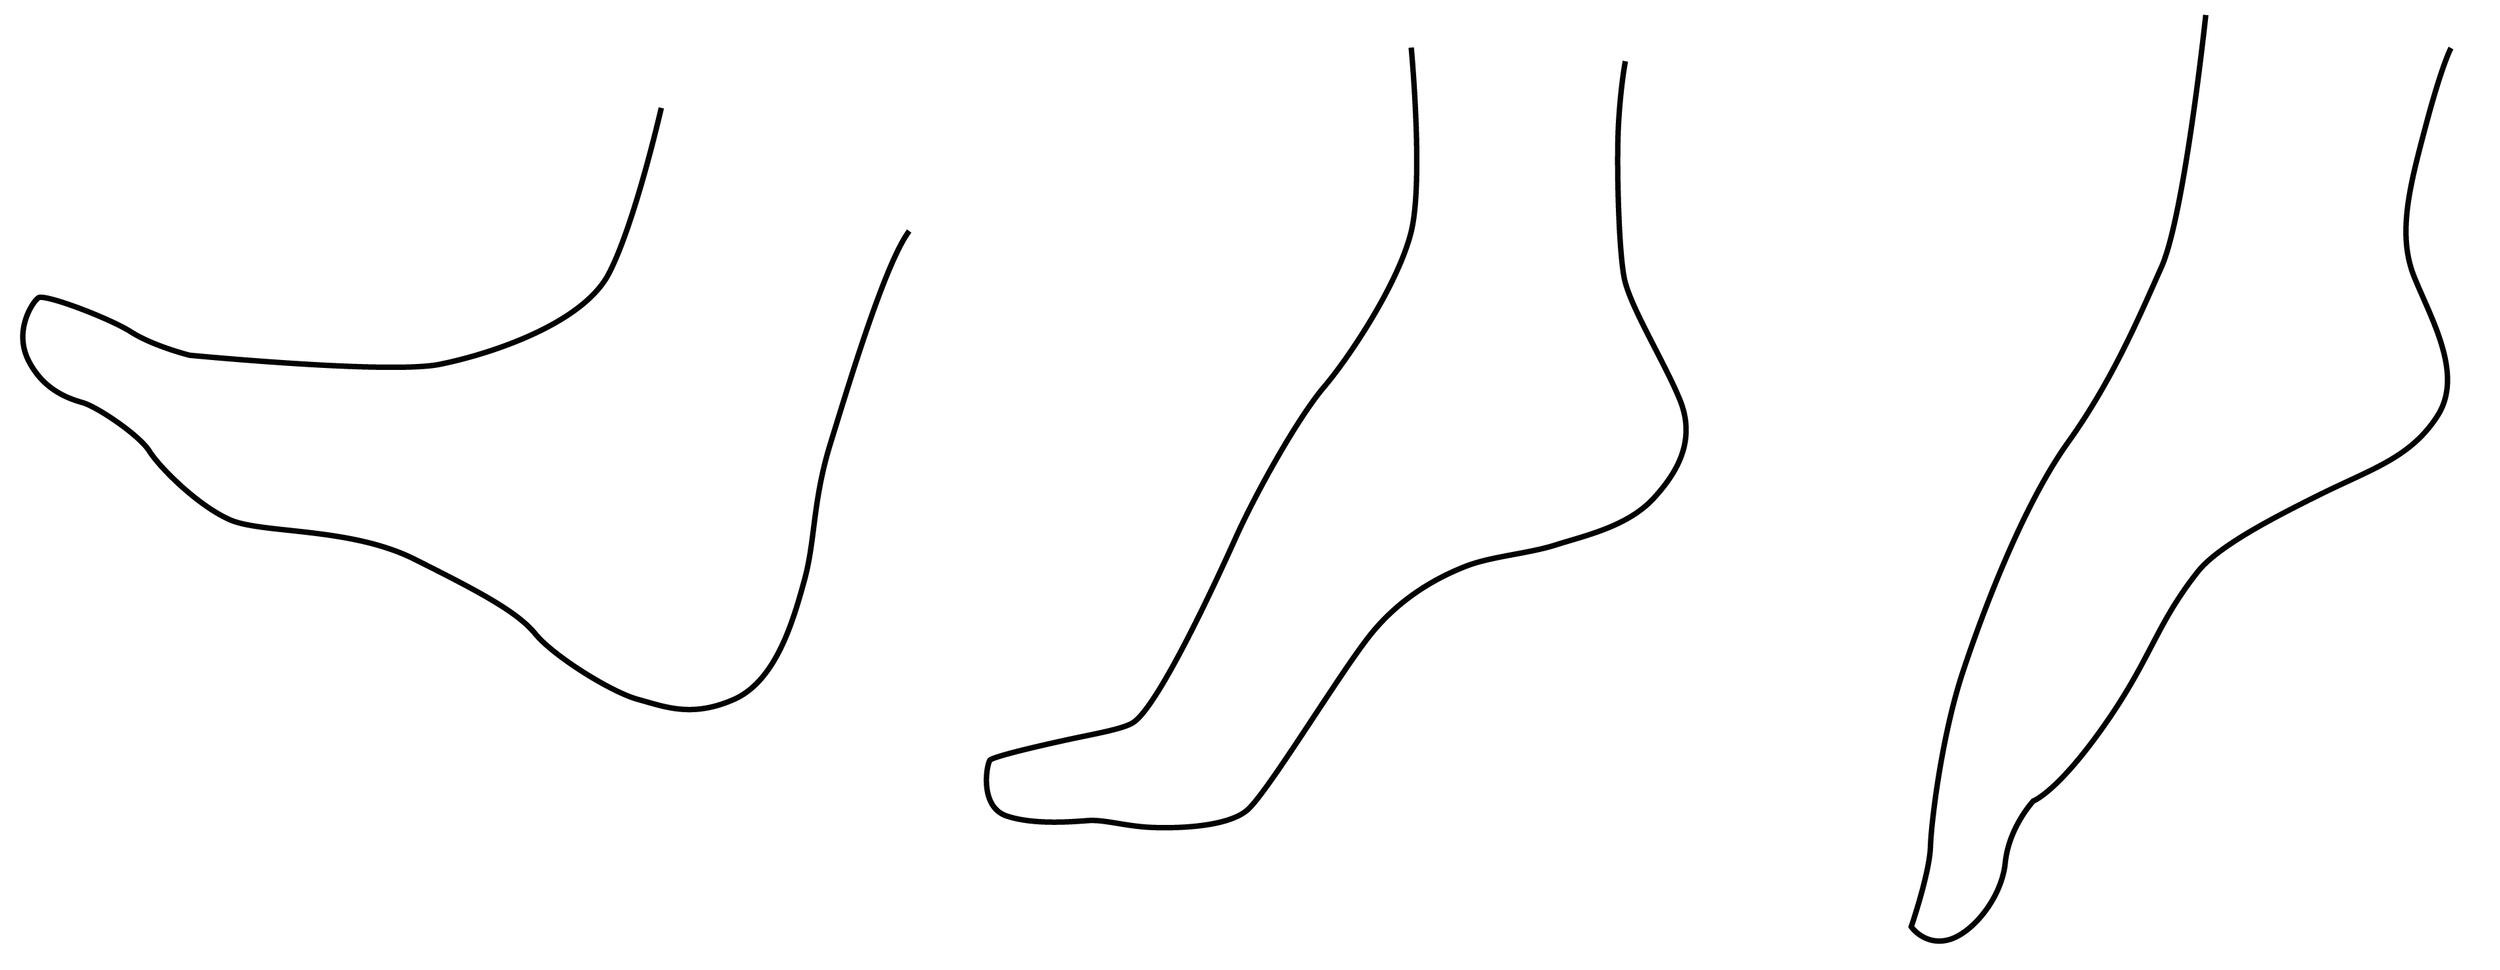 foot      flex studies